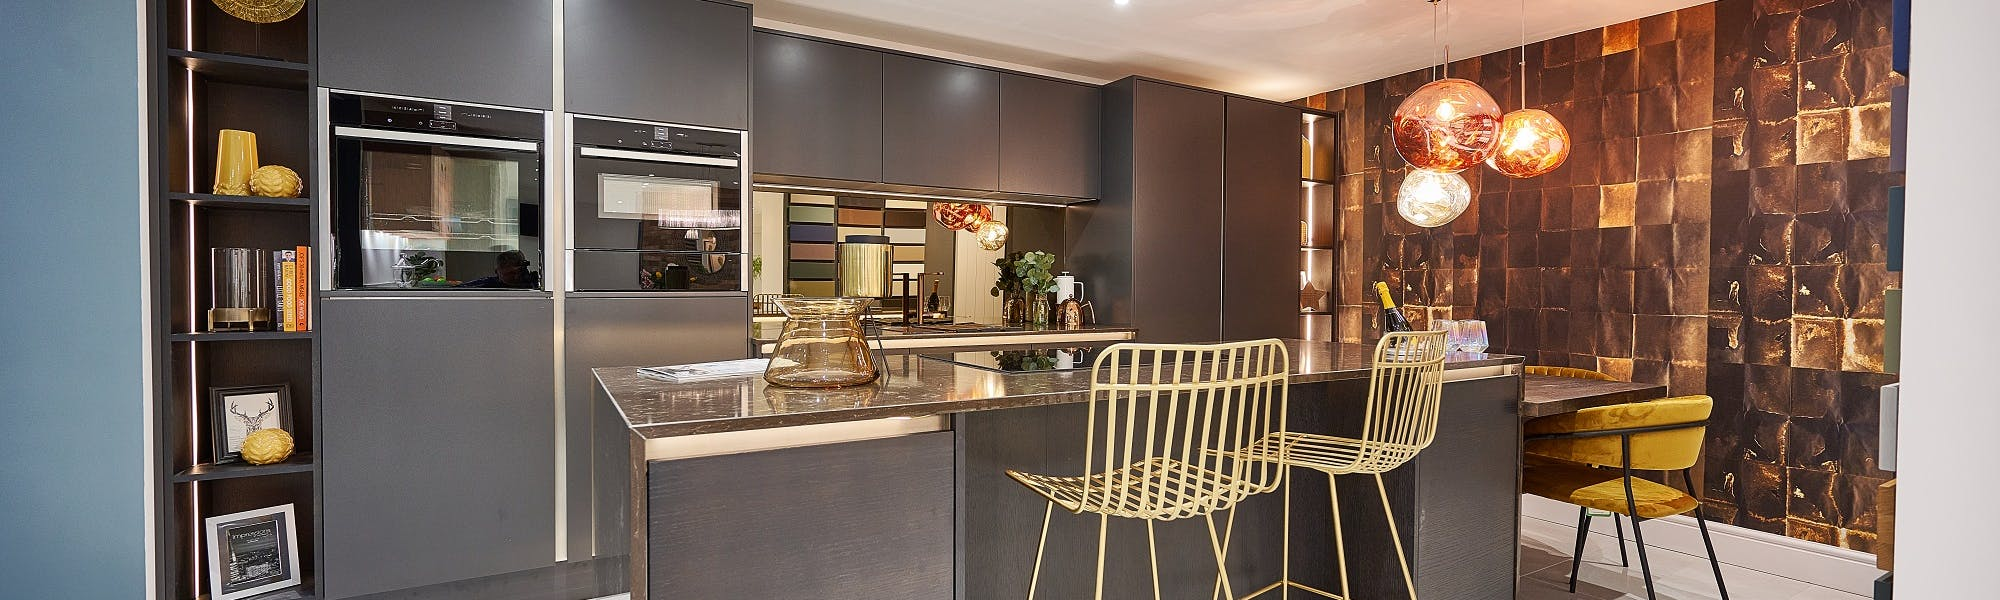 Kitchen Showroom Harrogate   Visit Us Today   More Kitchens